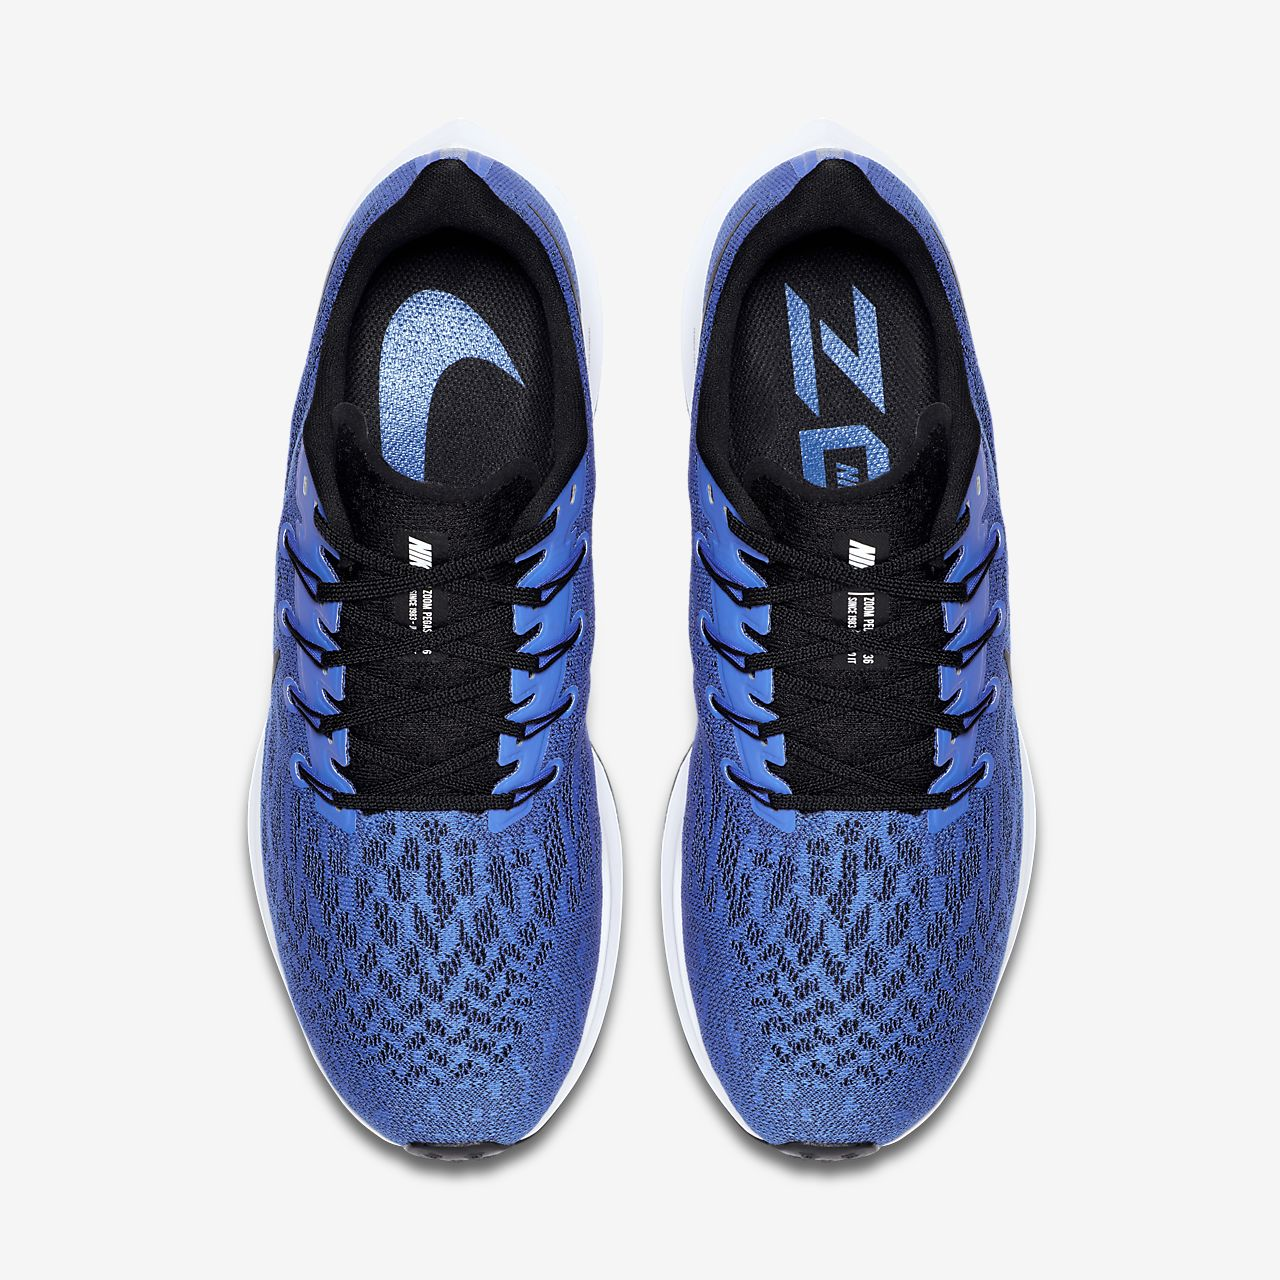 Zähler Nike Air Zoom Fly 2 Sportschuhe in Blau Herren